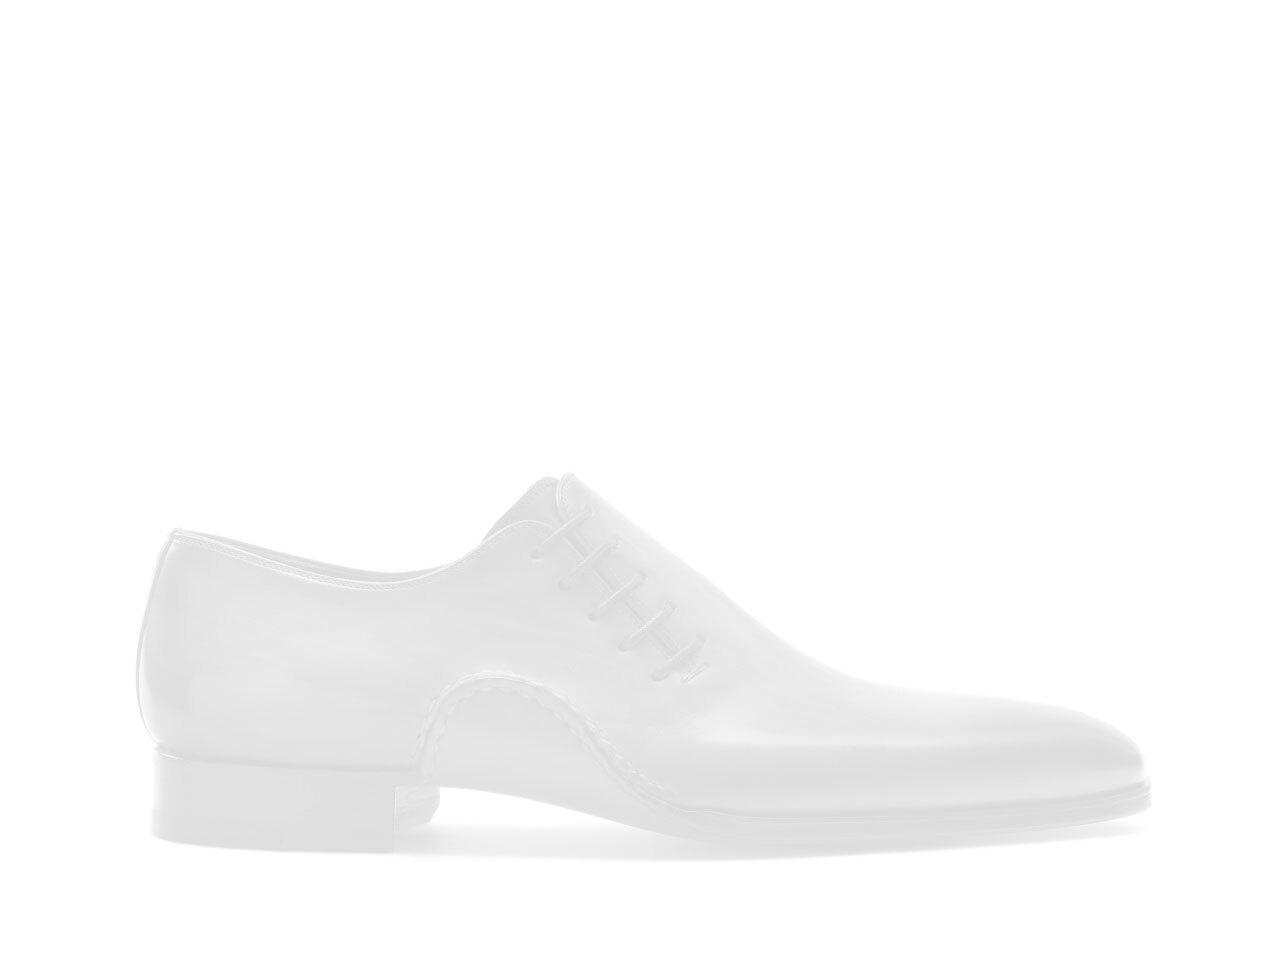 Sole of the Magnanni Dorio Navy Men's Velvet Loafers